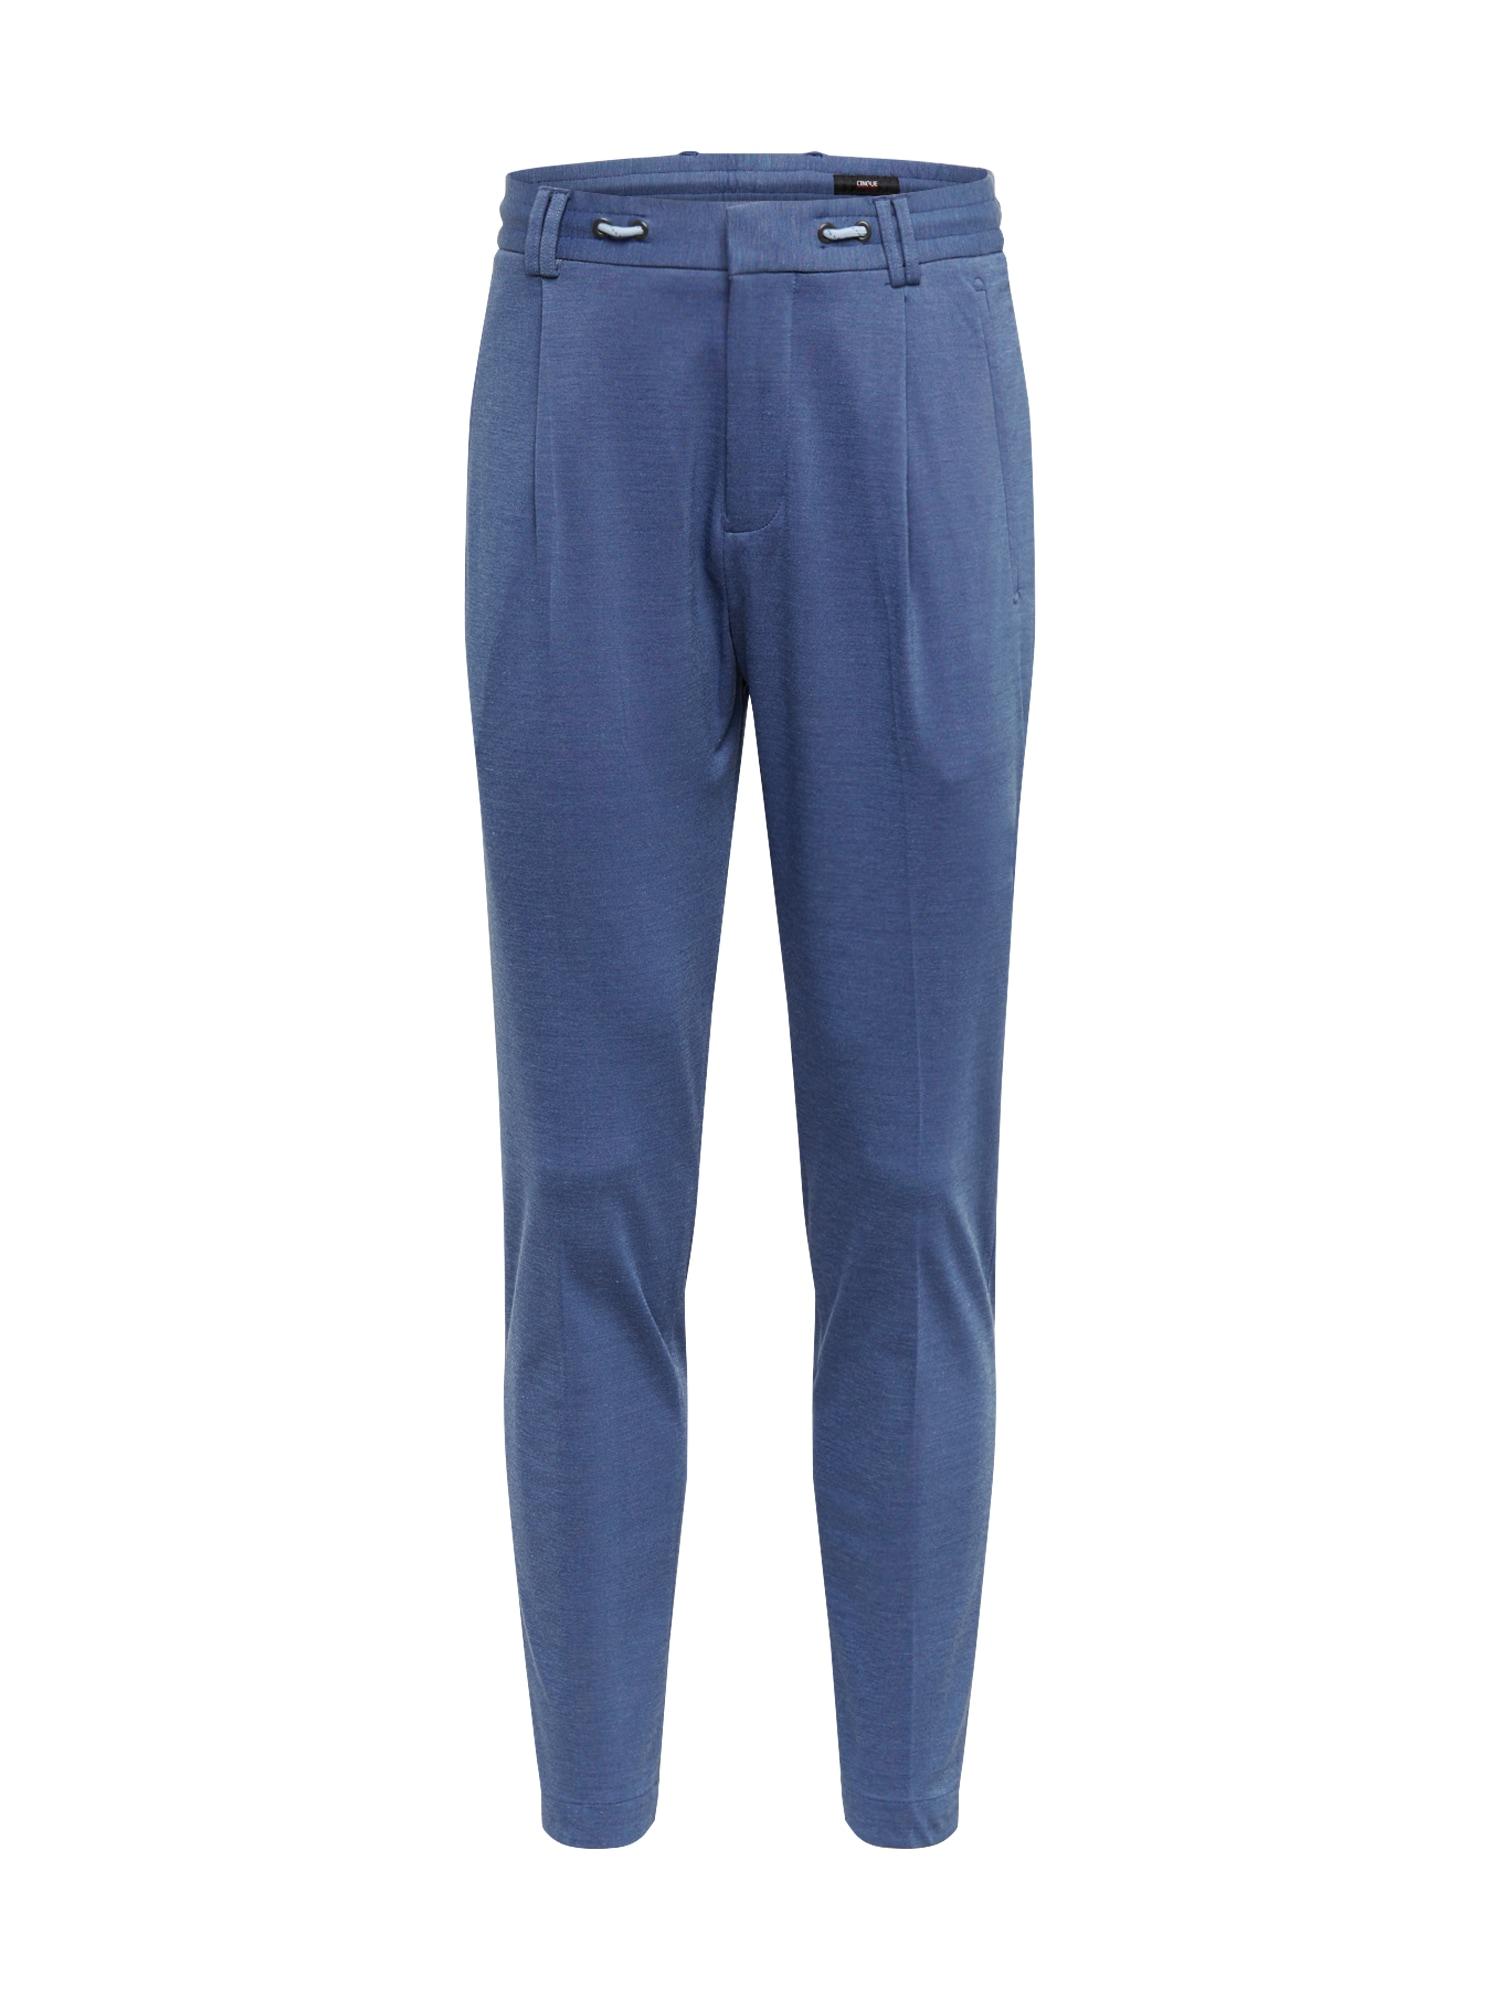 CINQUE Kalhoty 'CISALVO'  marine modrá